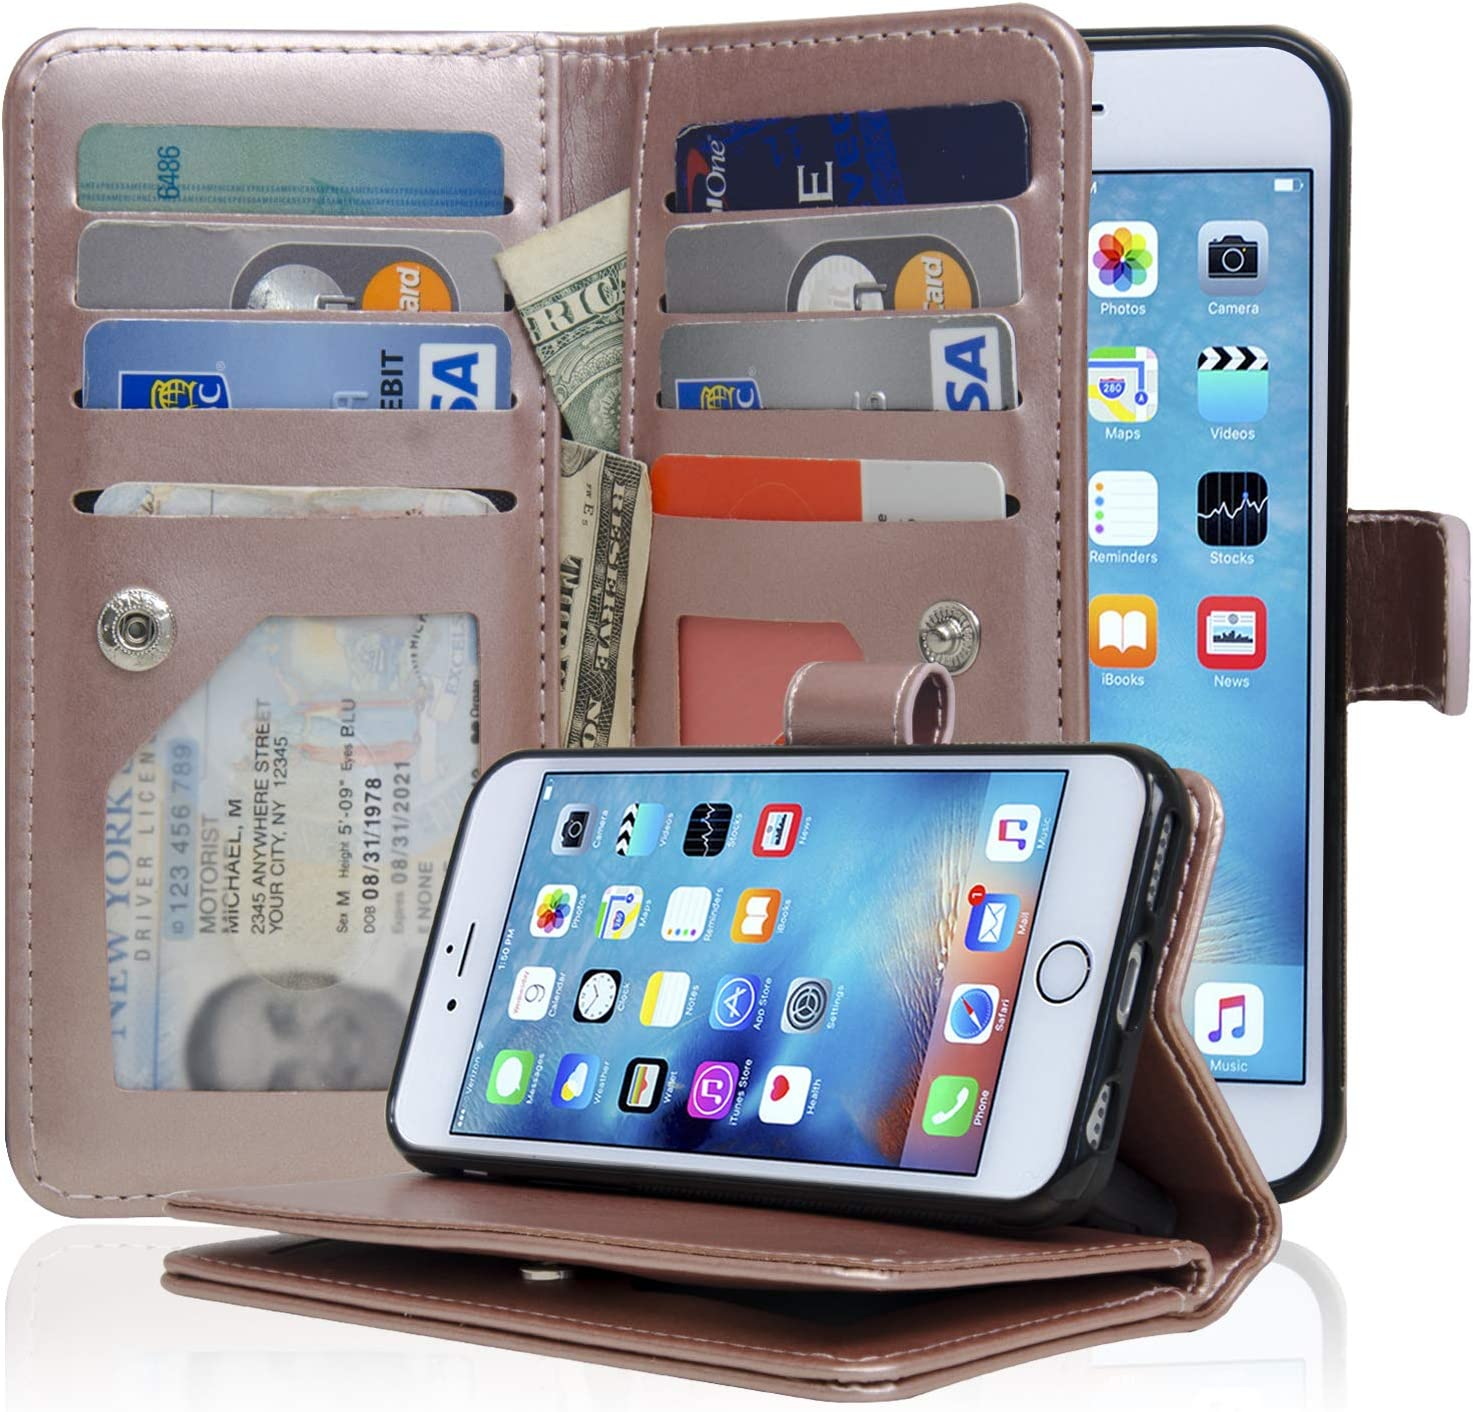 NAVOR Detachable Magnetic Housing Flip Wallet Case for iPhone 6 / 6S [4.7 Inch] - Rose Gold (IP63RG)